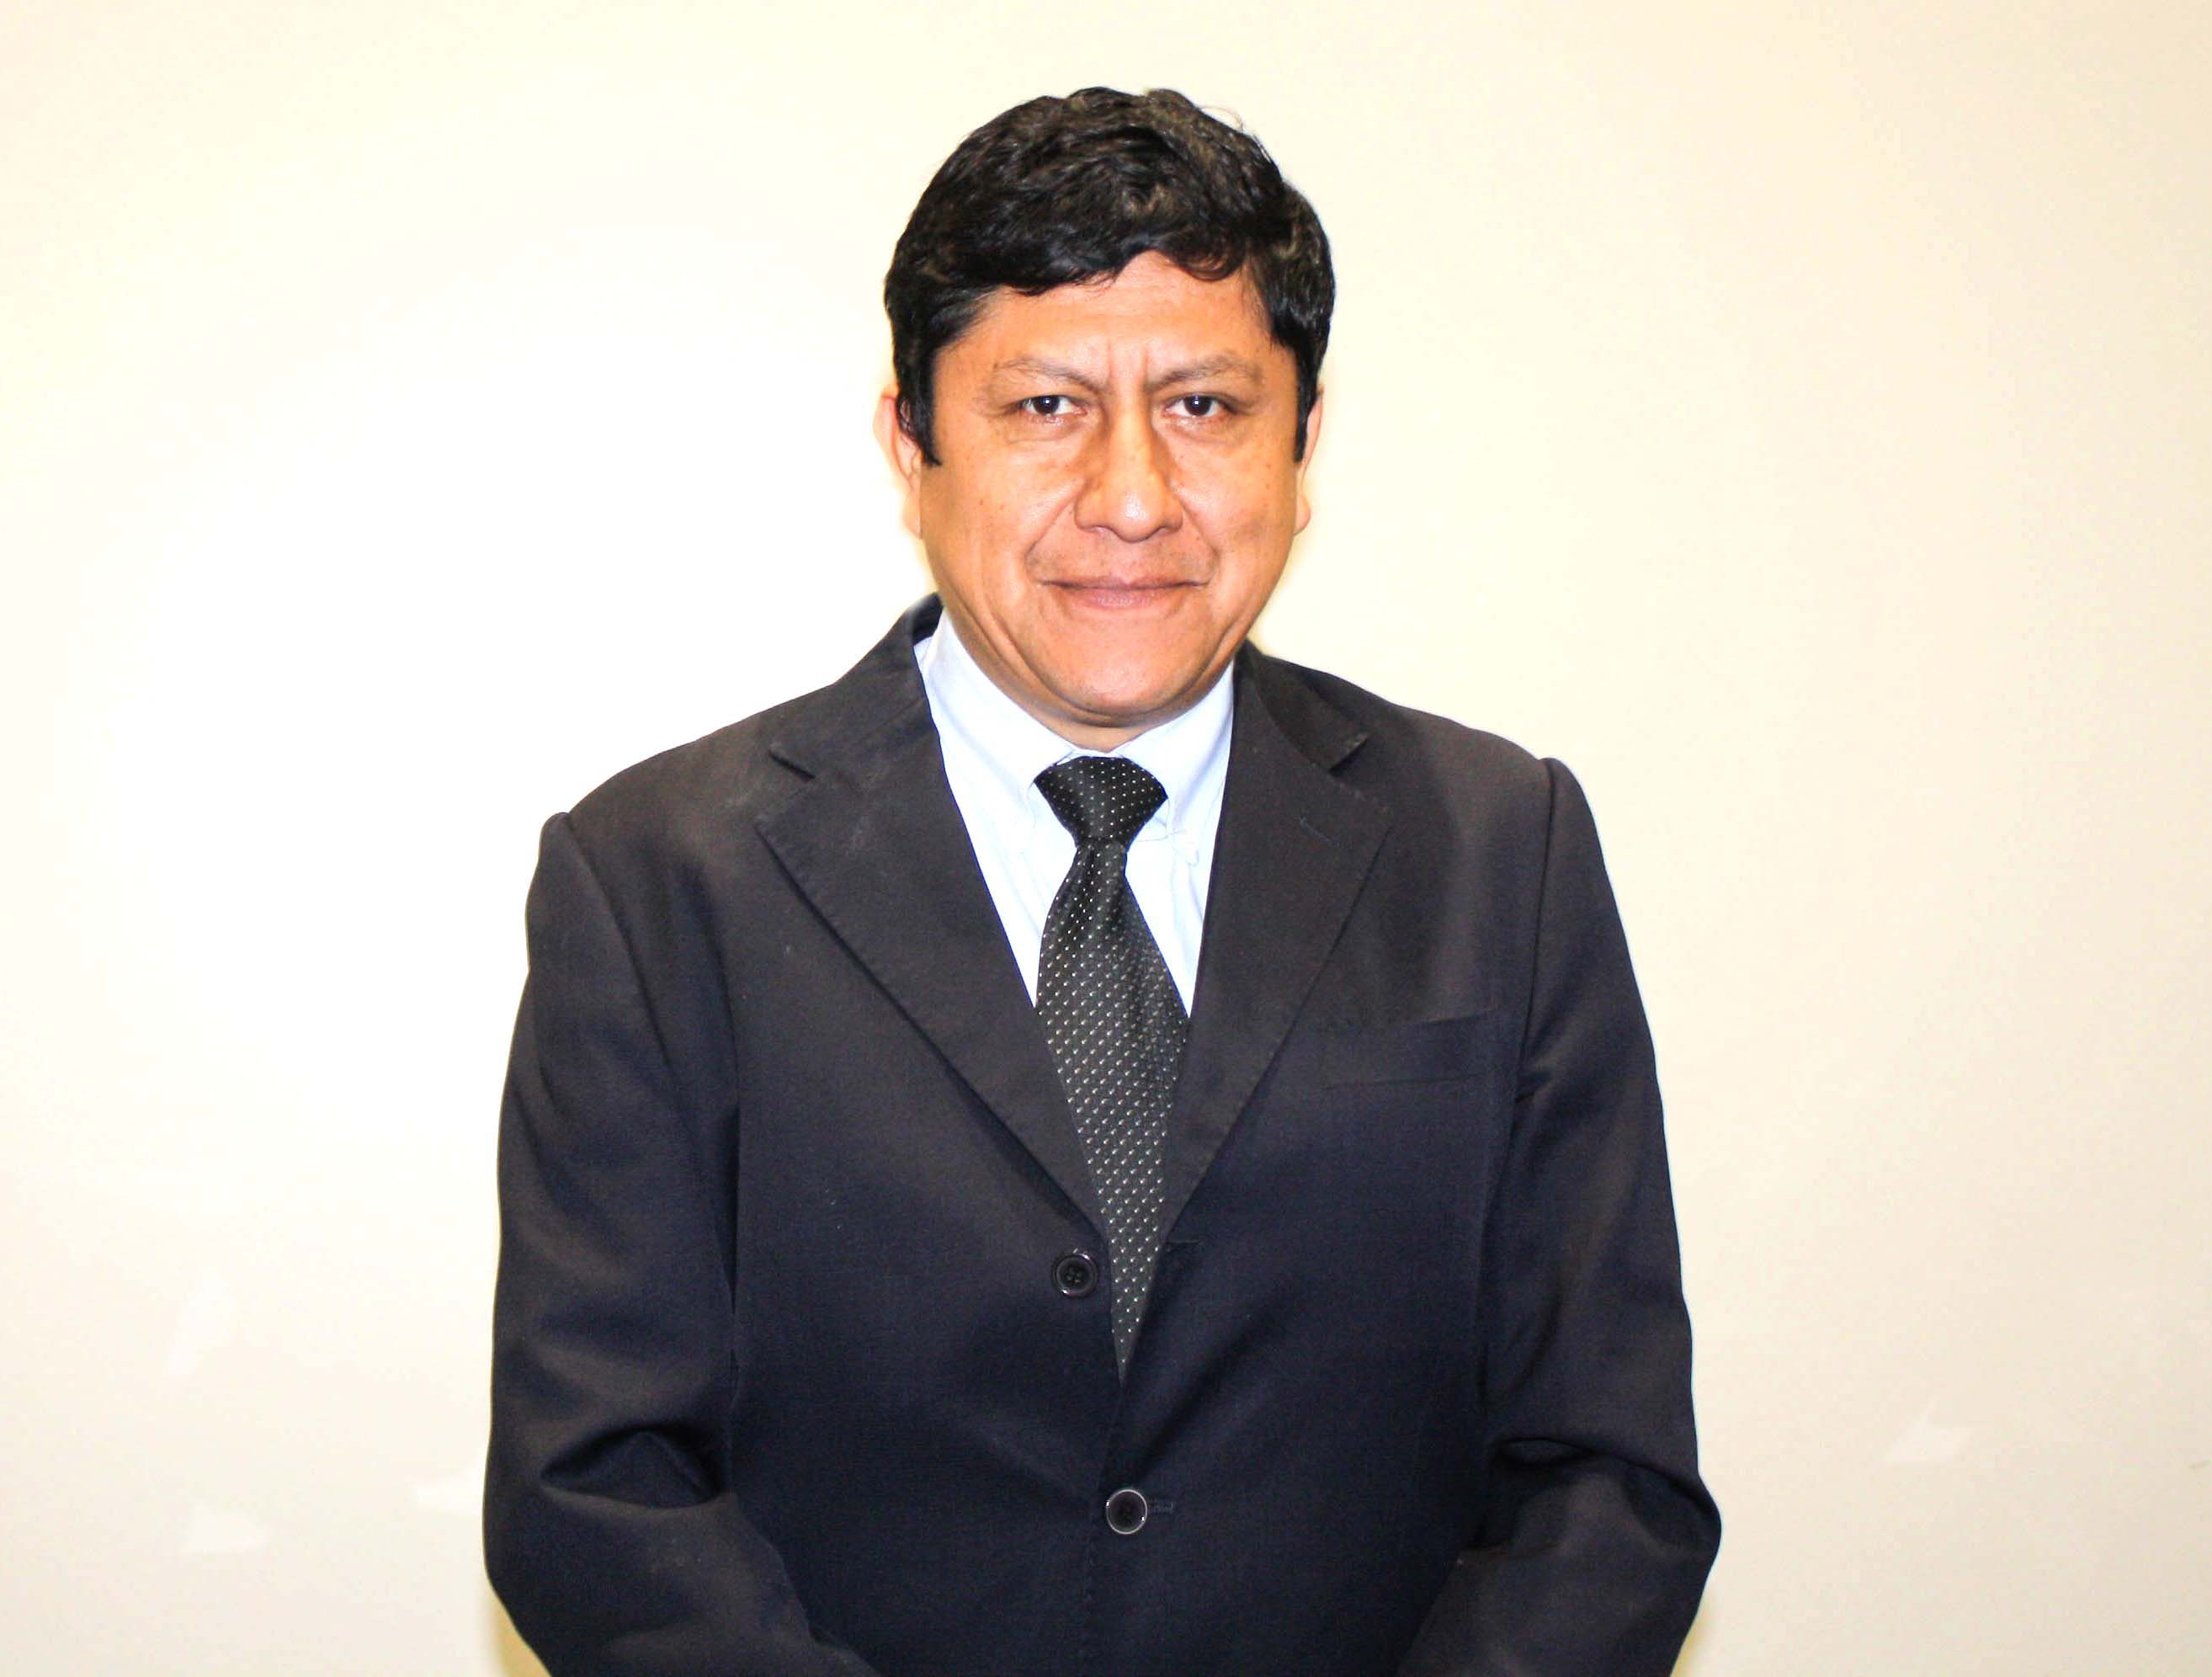 Dr. Juan Rodríguez Rodríguez